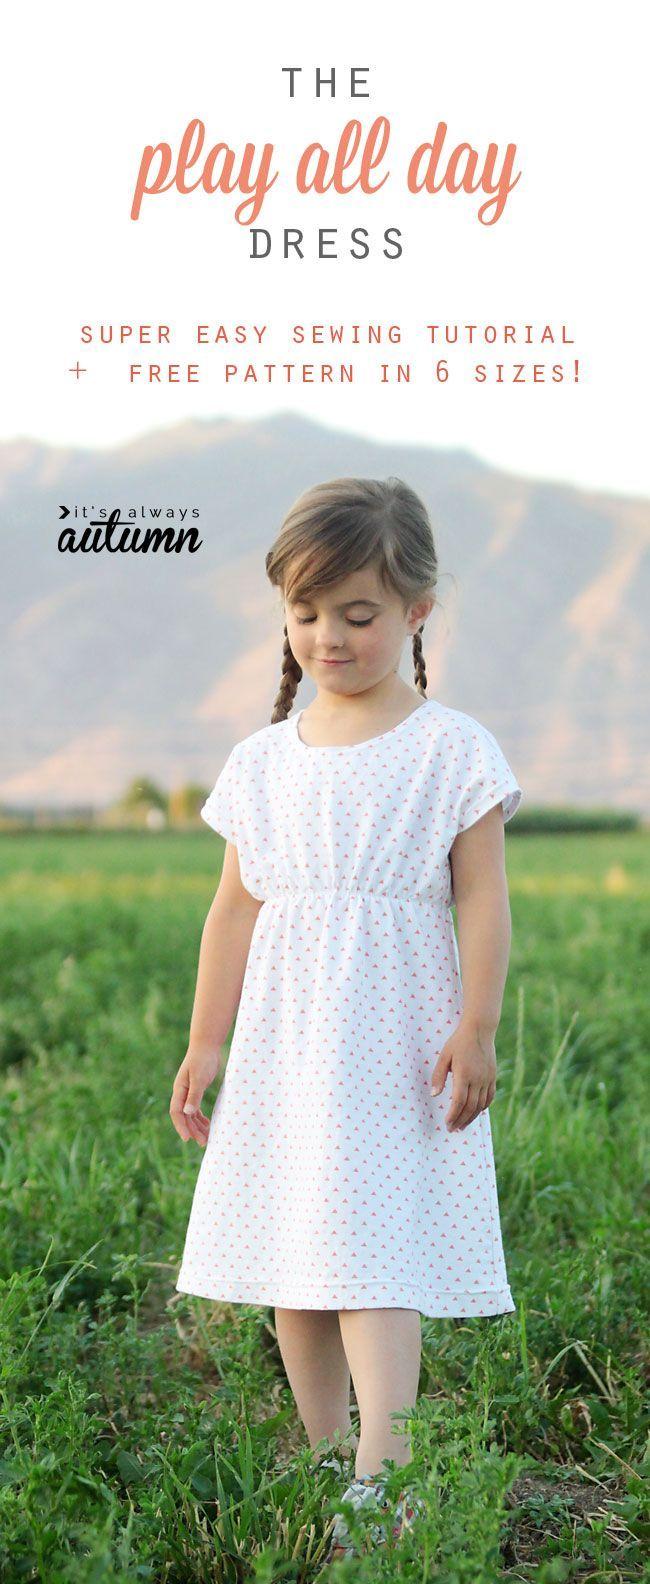 The playallday dress free girlsu dress pattern in sizes dress